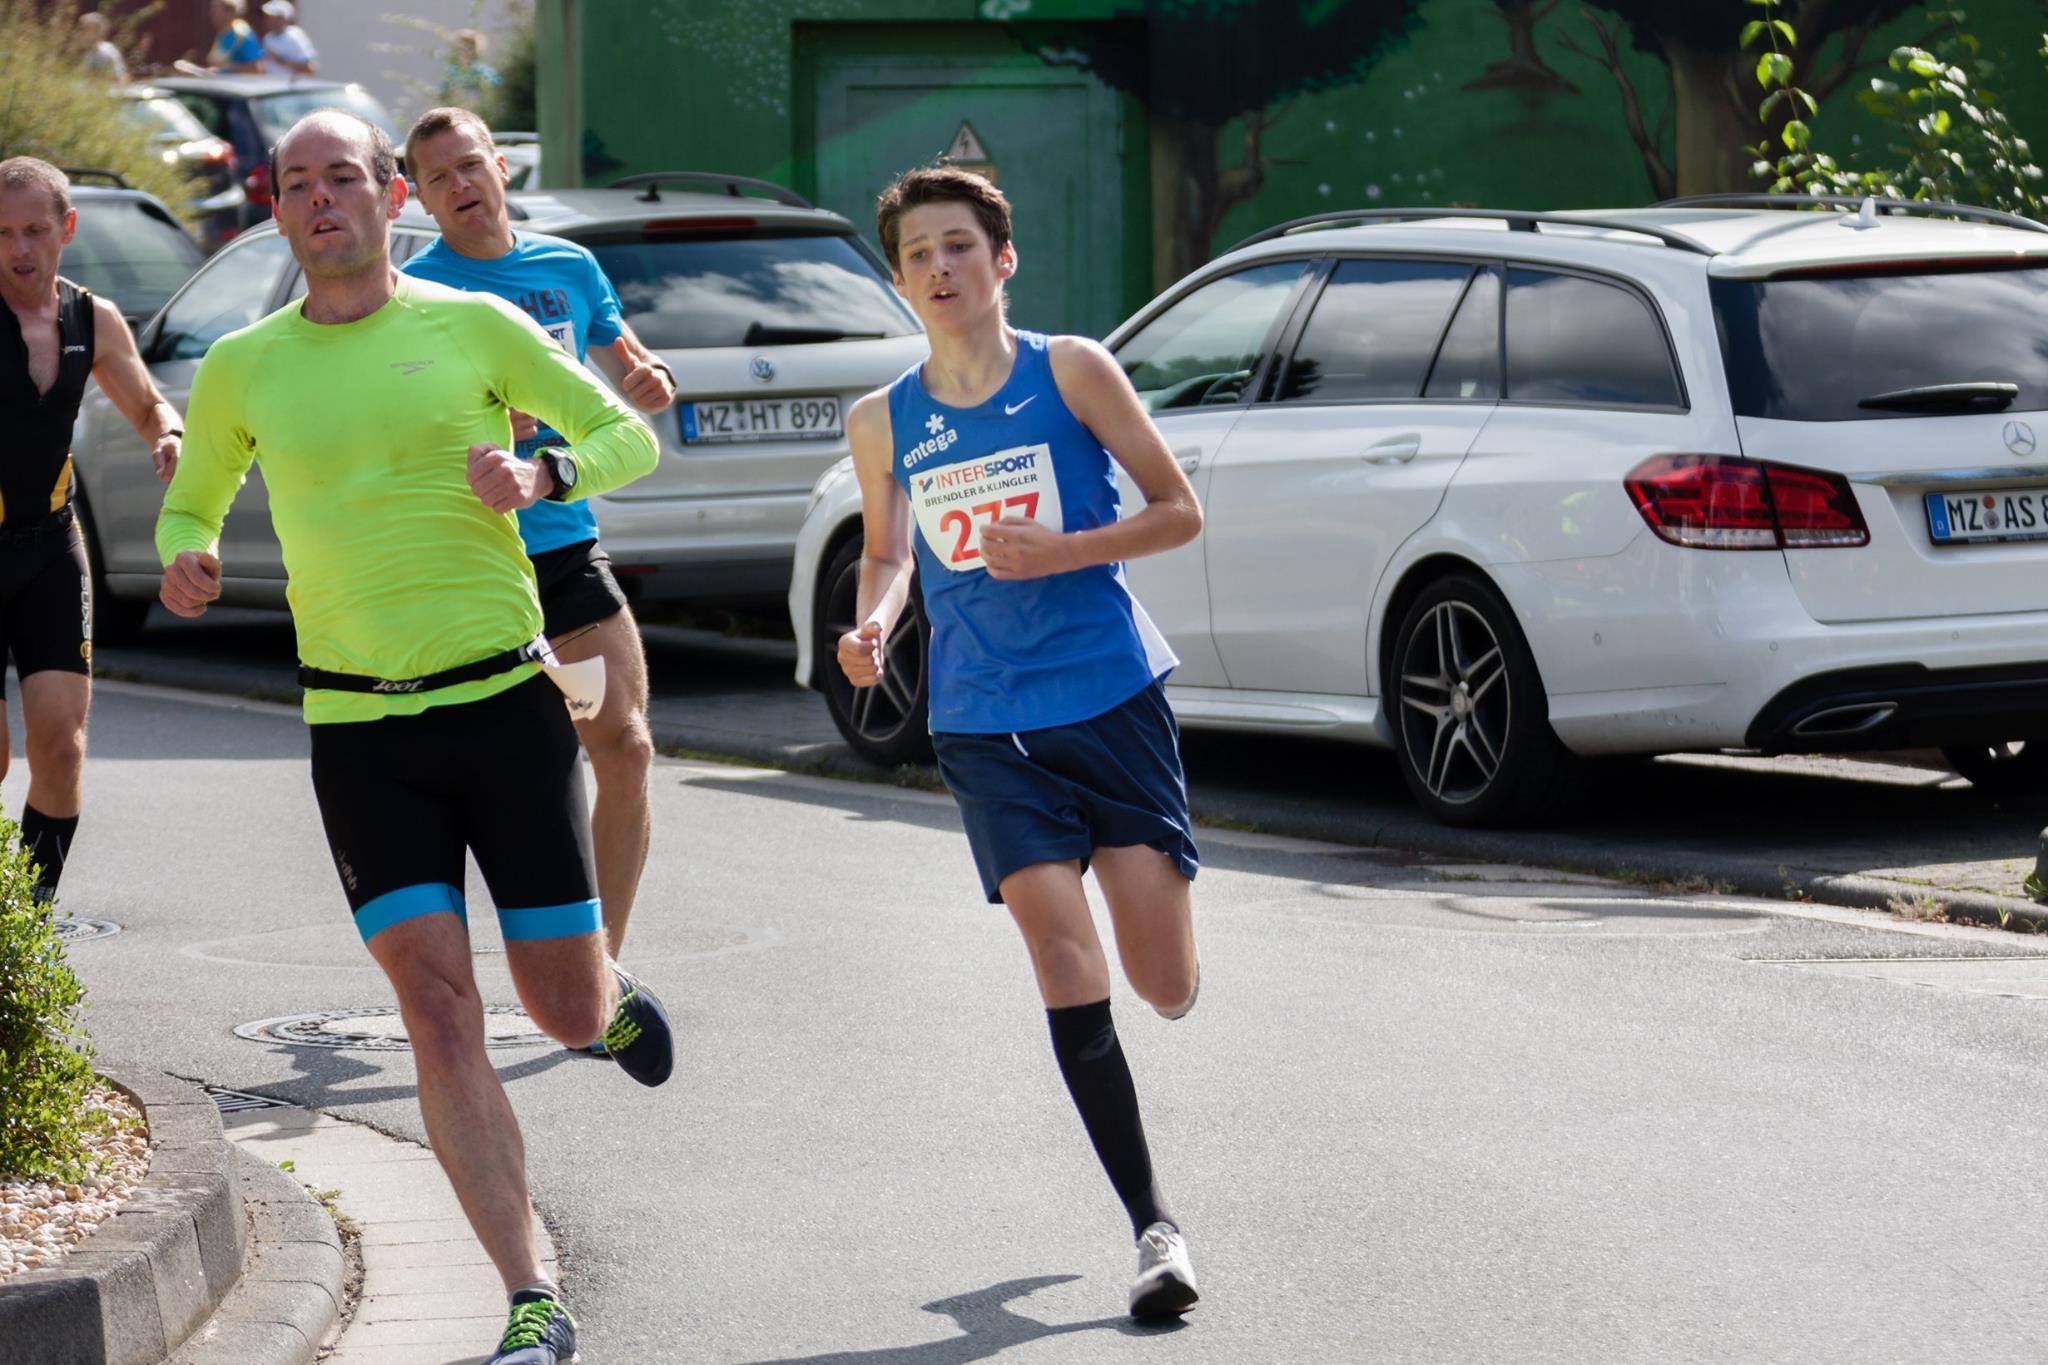 Kid running the 5k, pretty impressive